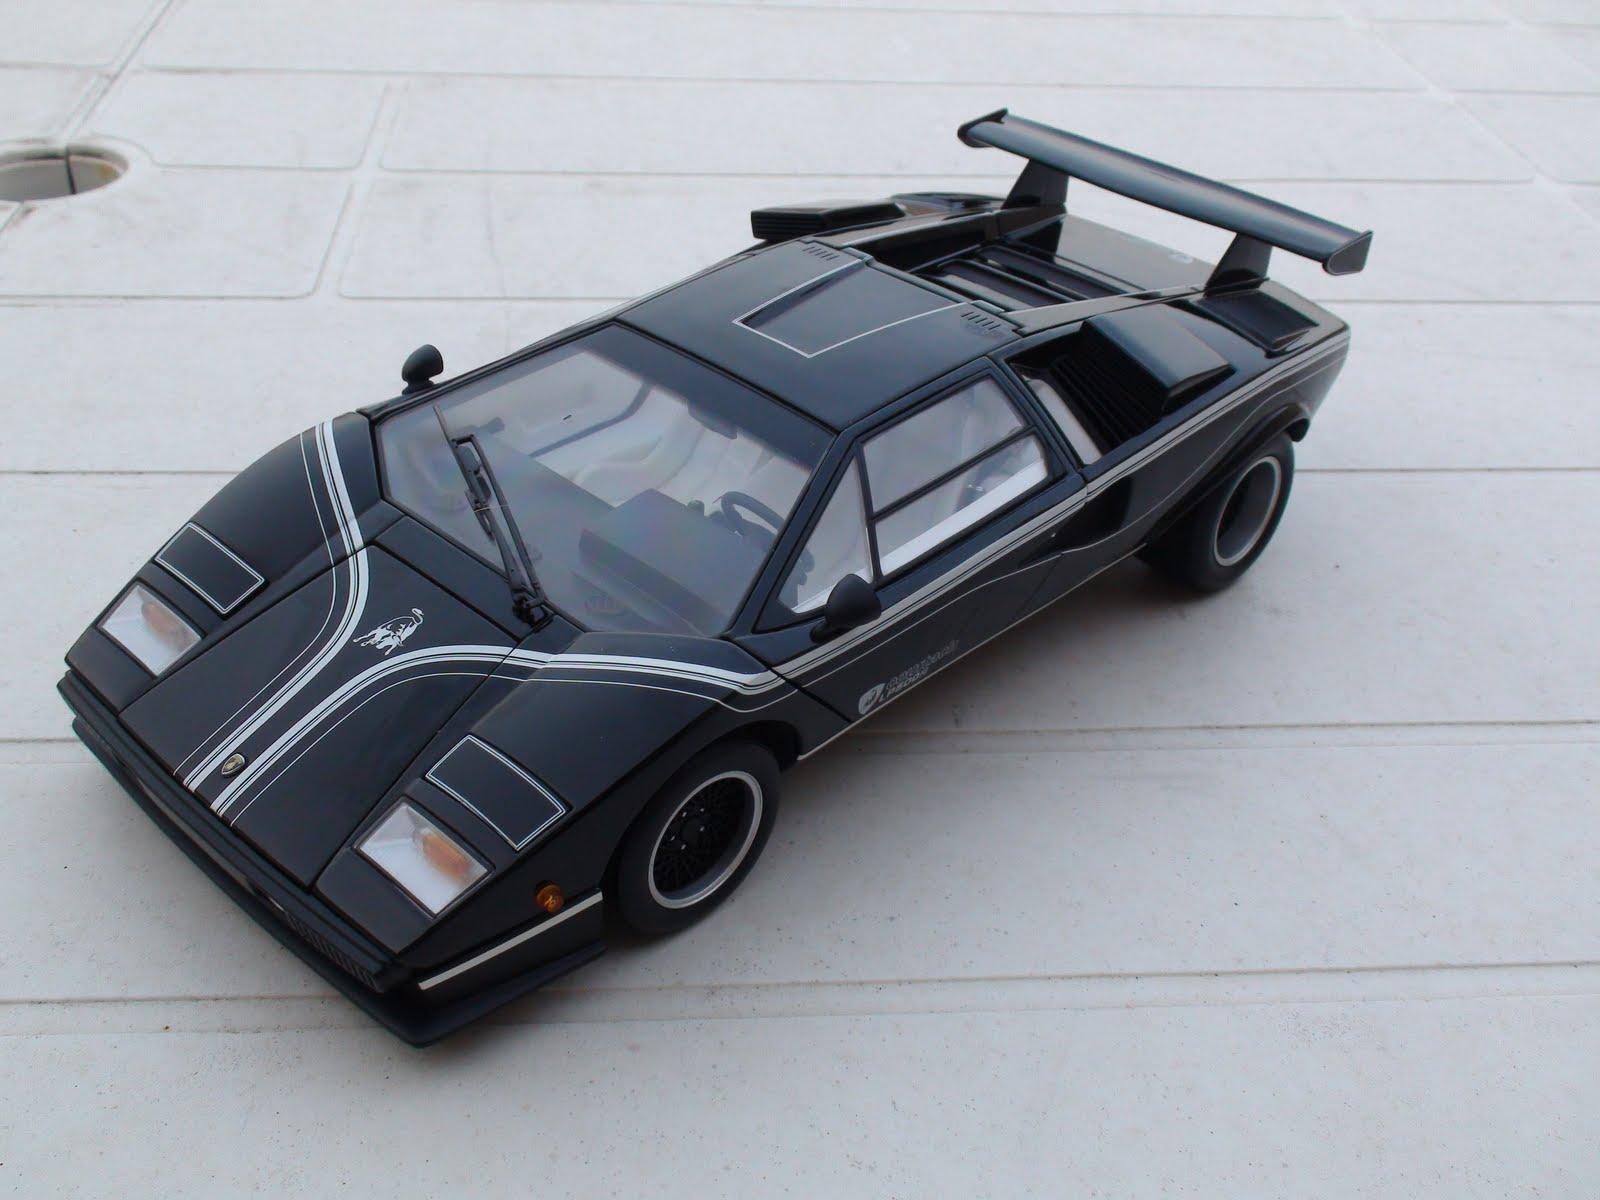 DSC02807 Cool Lamborghini Countach Diecast 1 18 Cars Trend